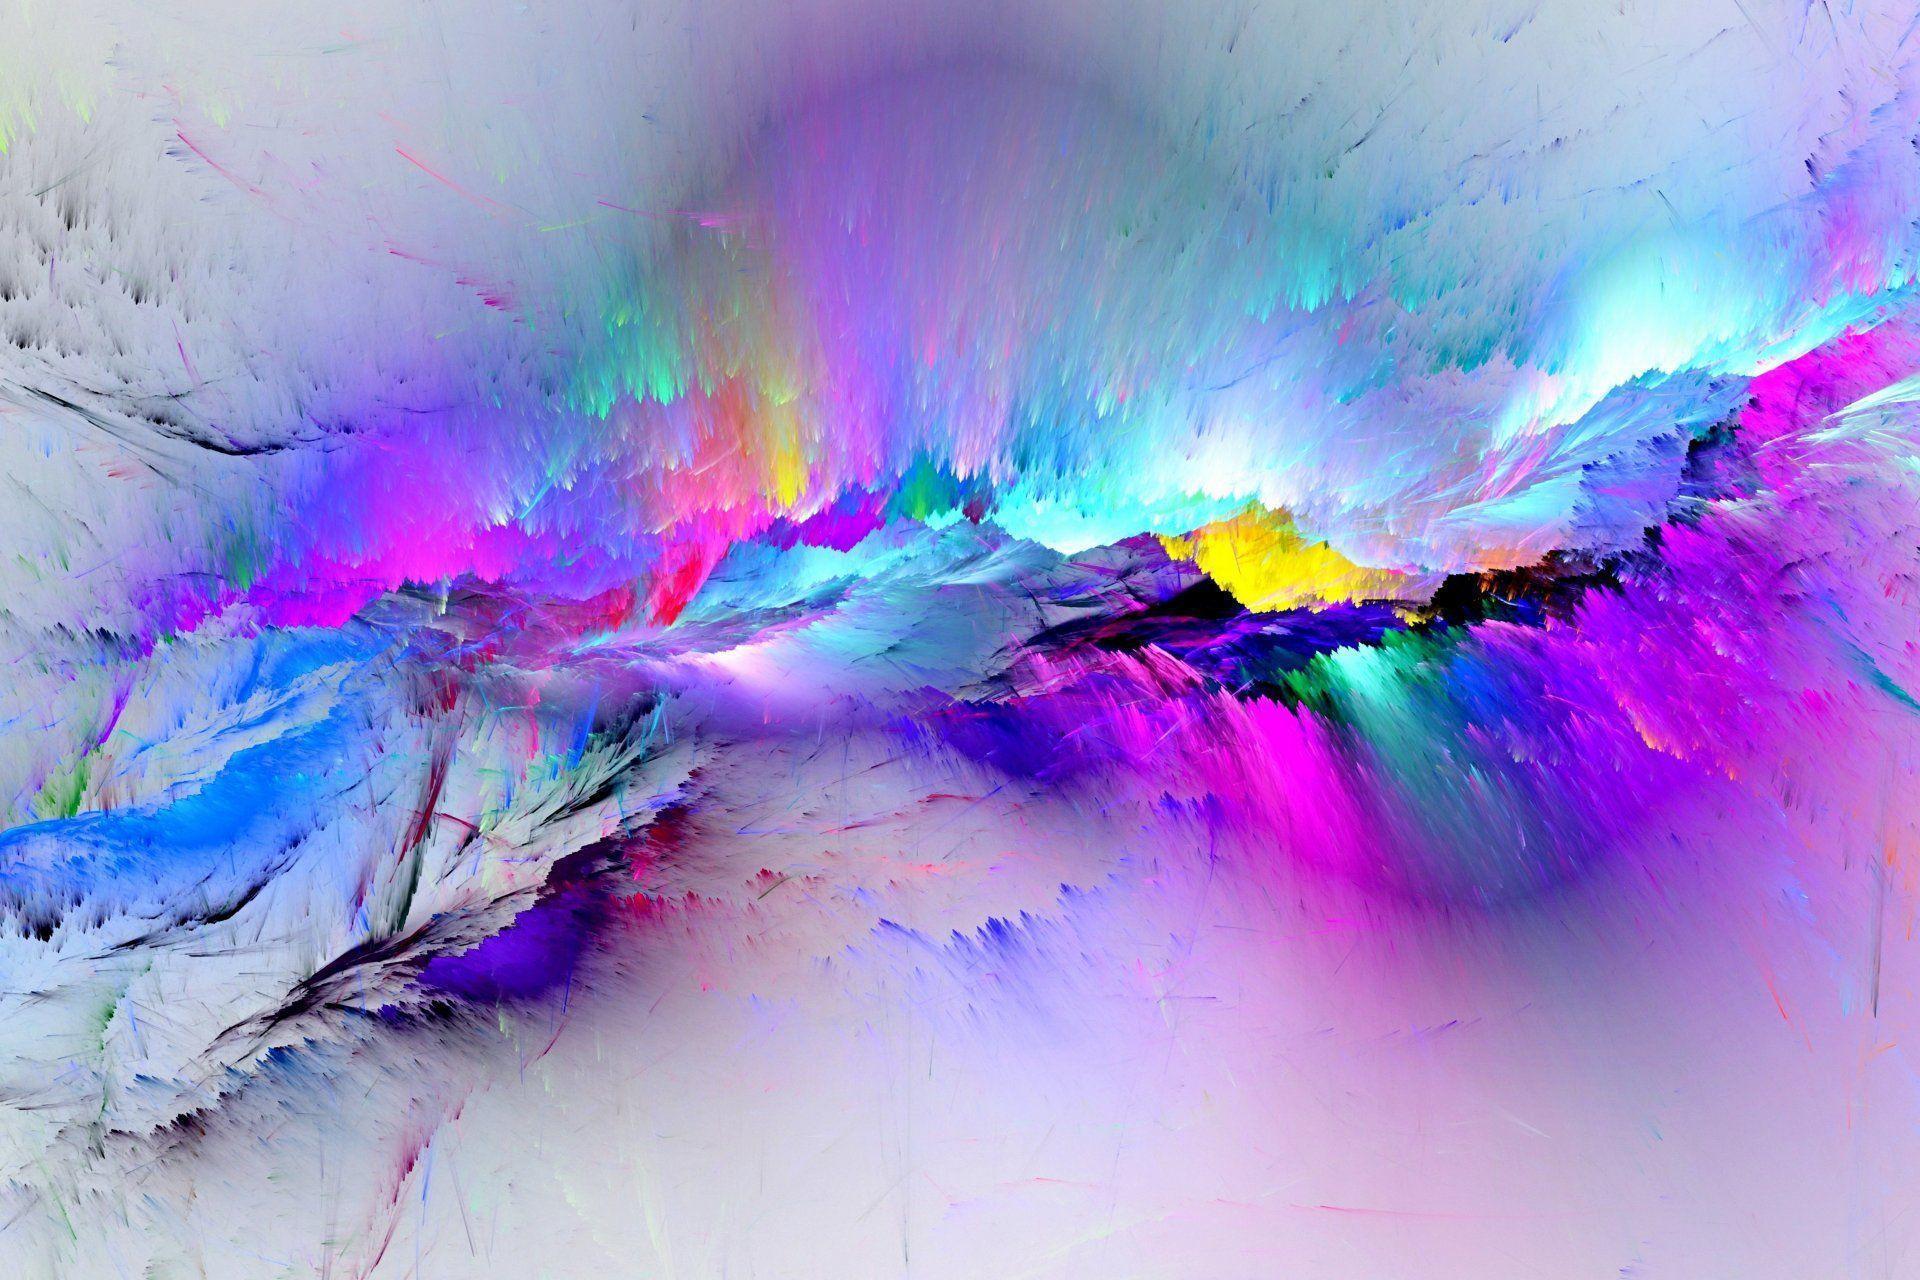 Fortnite Wallpaper Spray Paint Spray Paint Wallpapers Wallpaper Cave